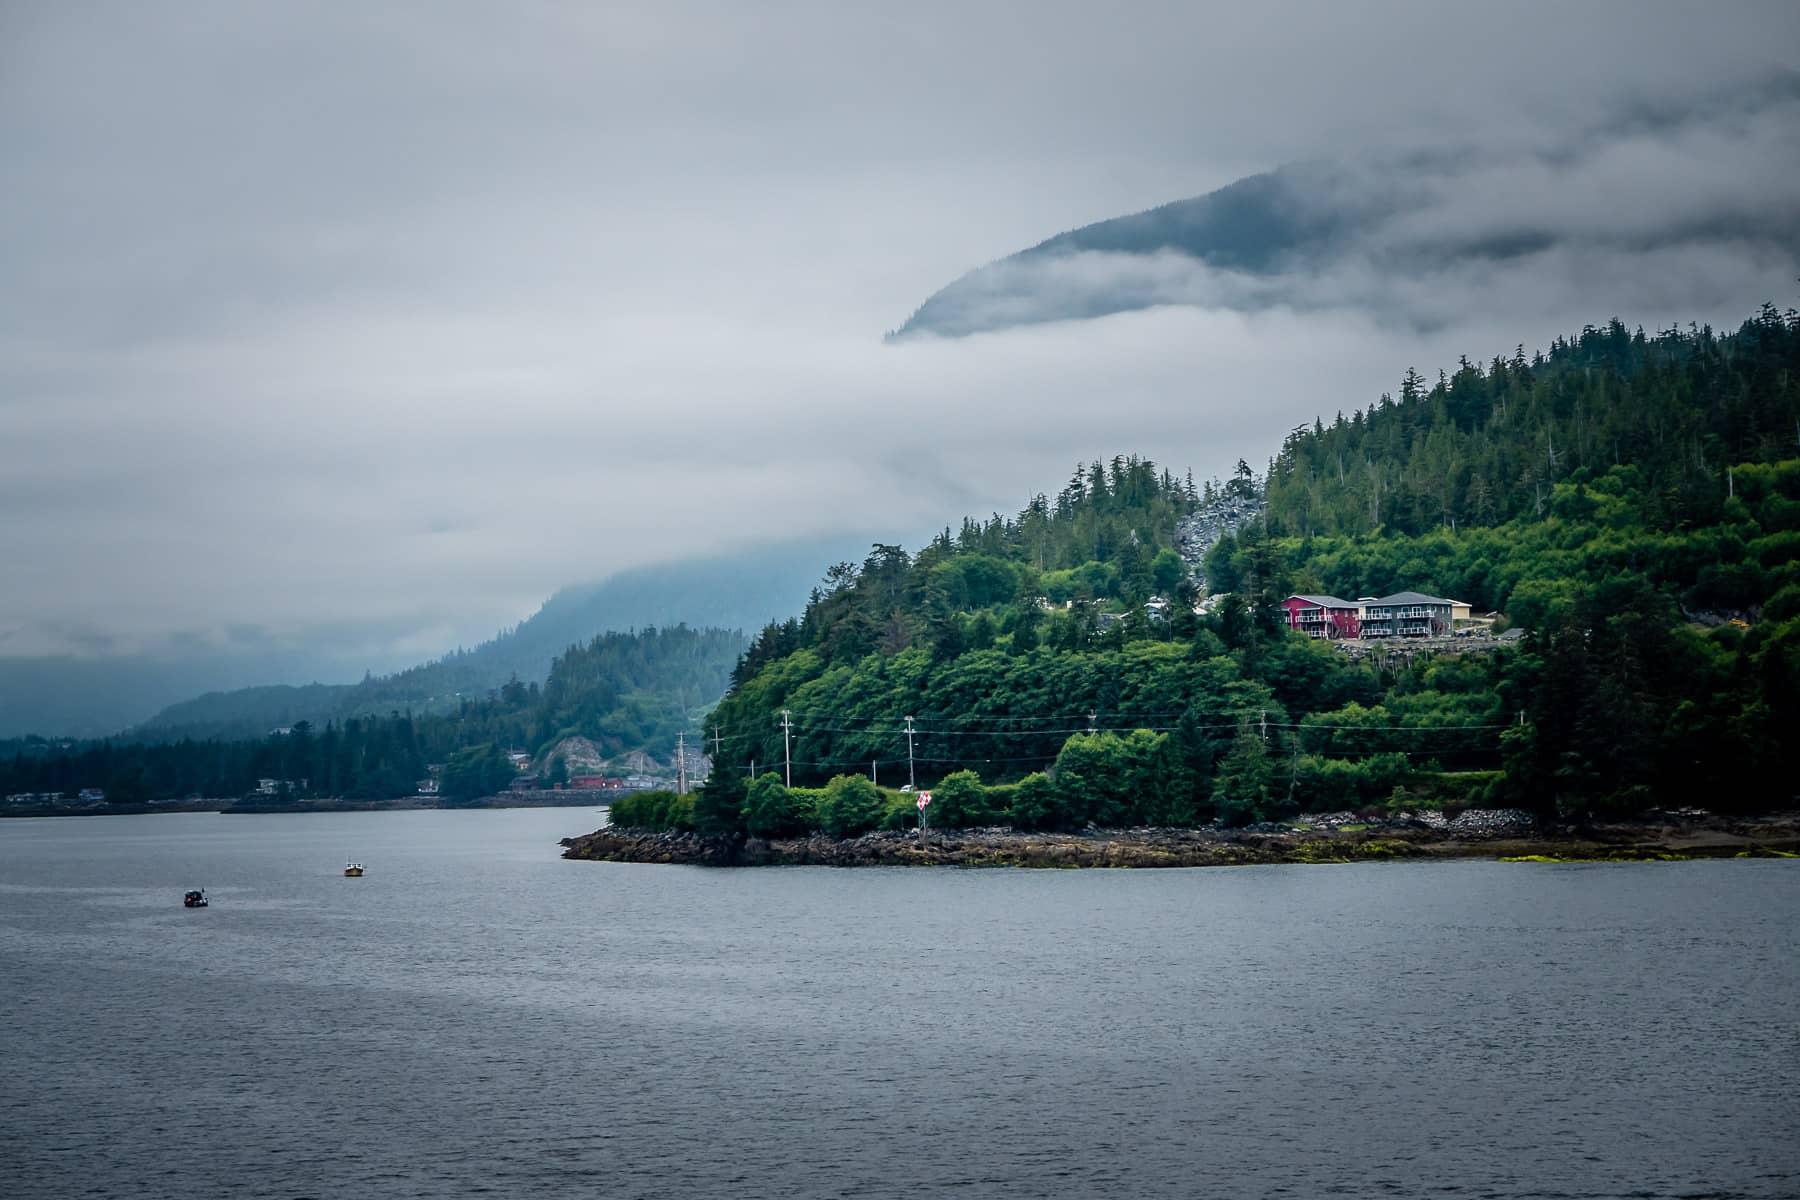 The morning fog of the Tongass Narrows begins to lift on Ketchikan, Alaska.